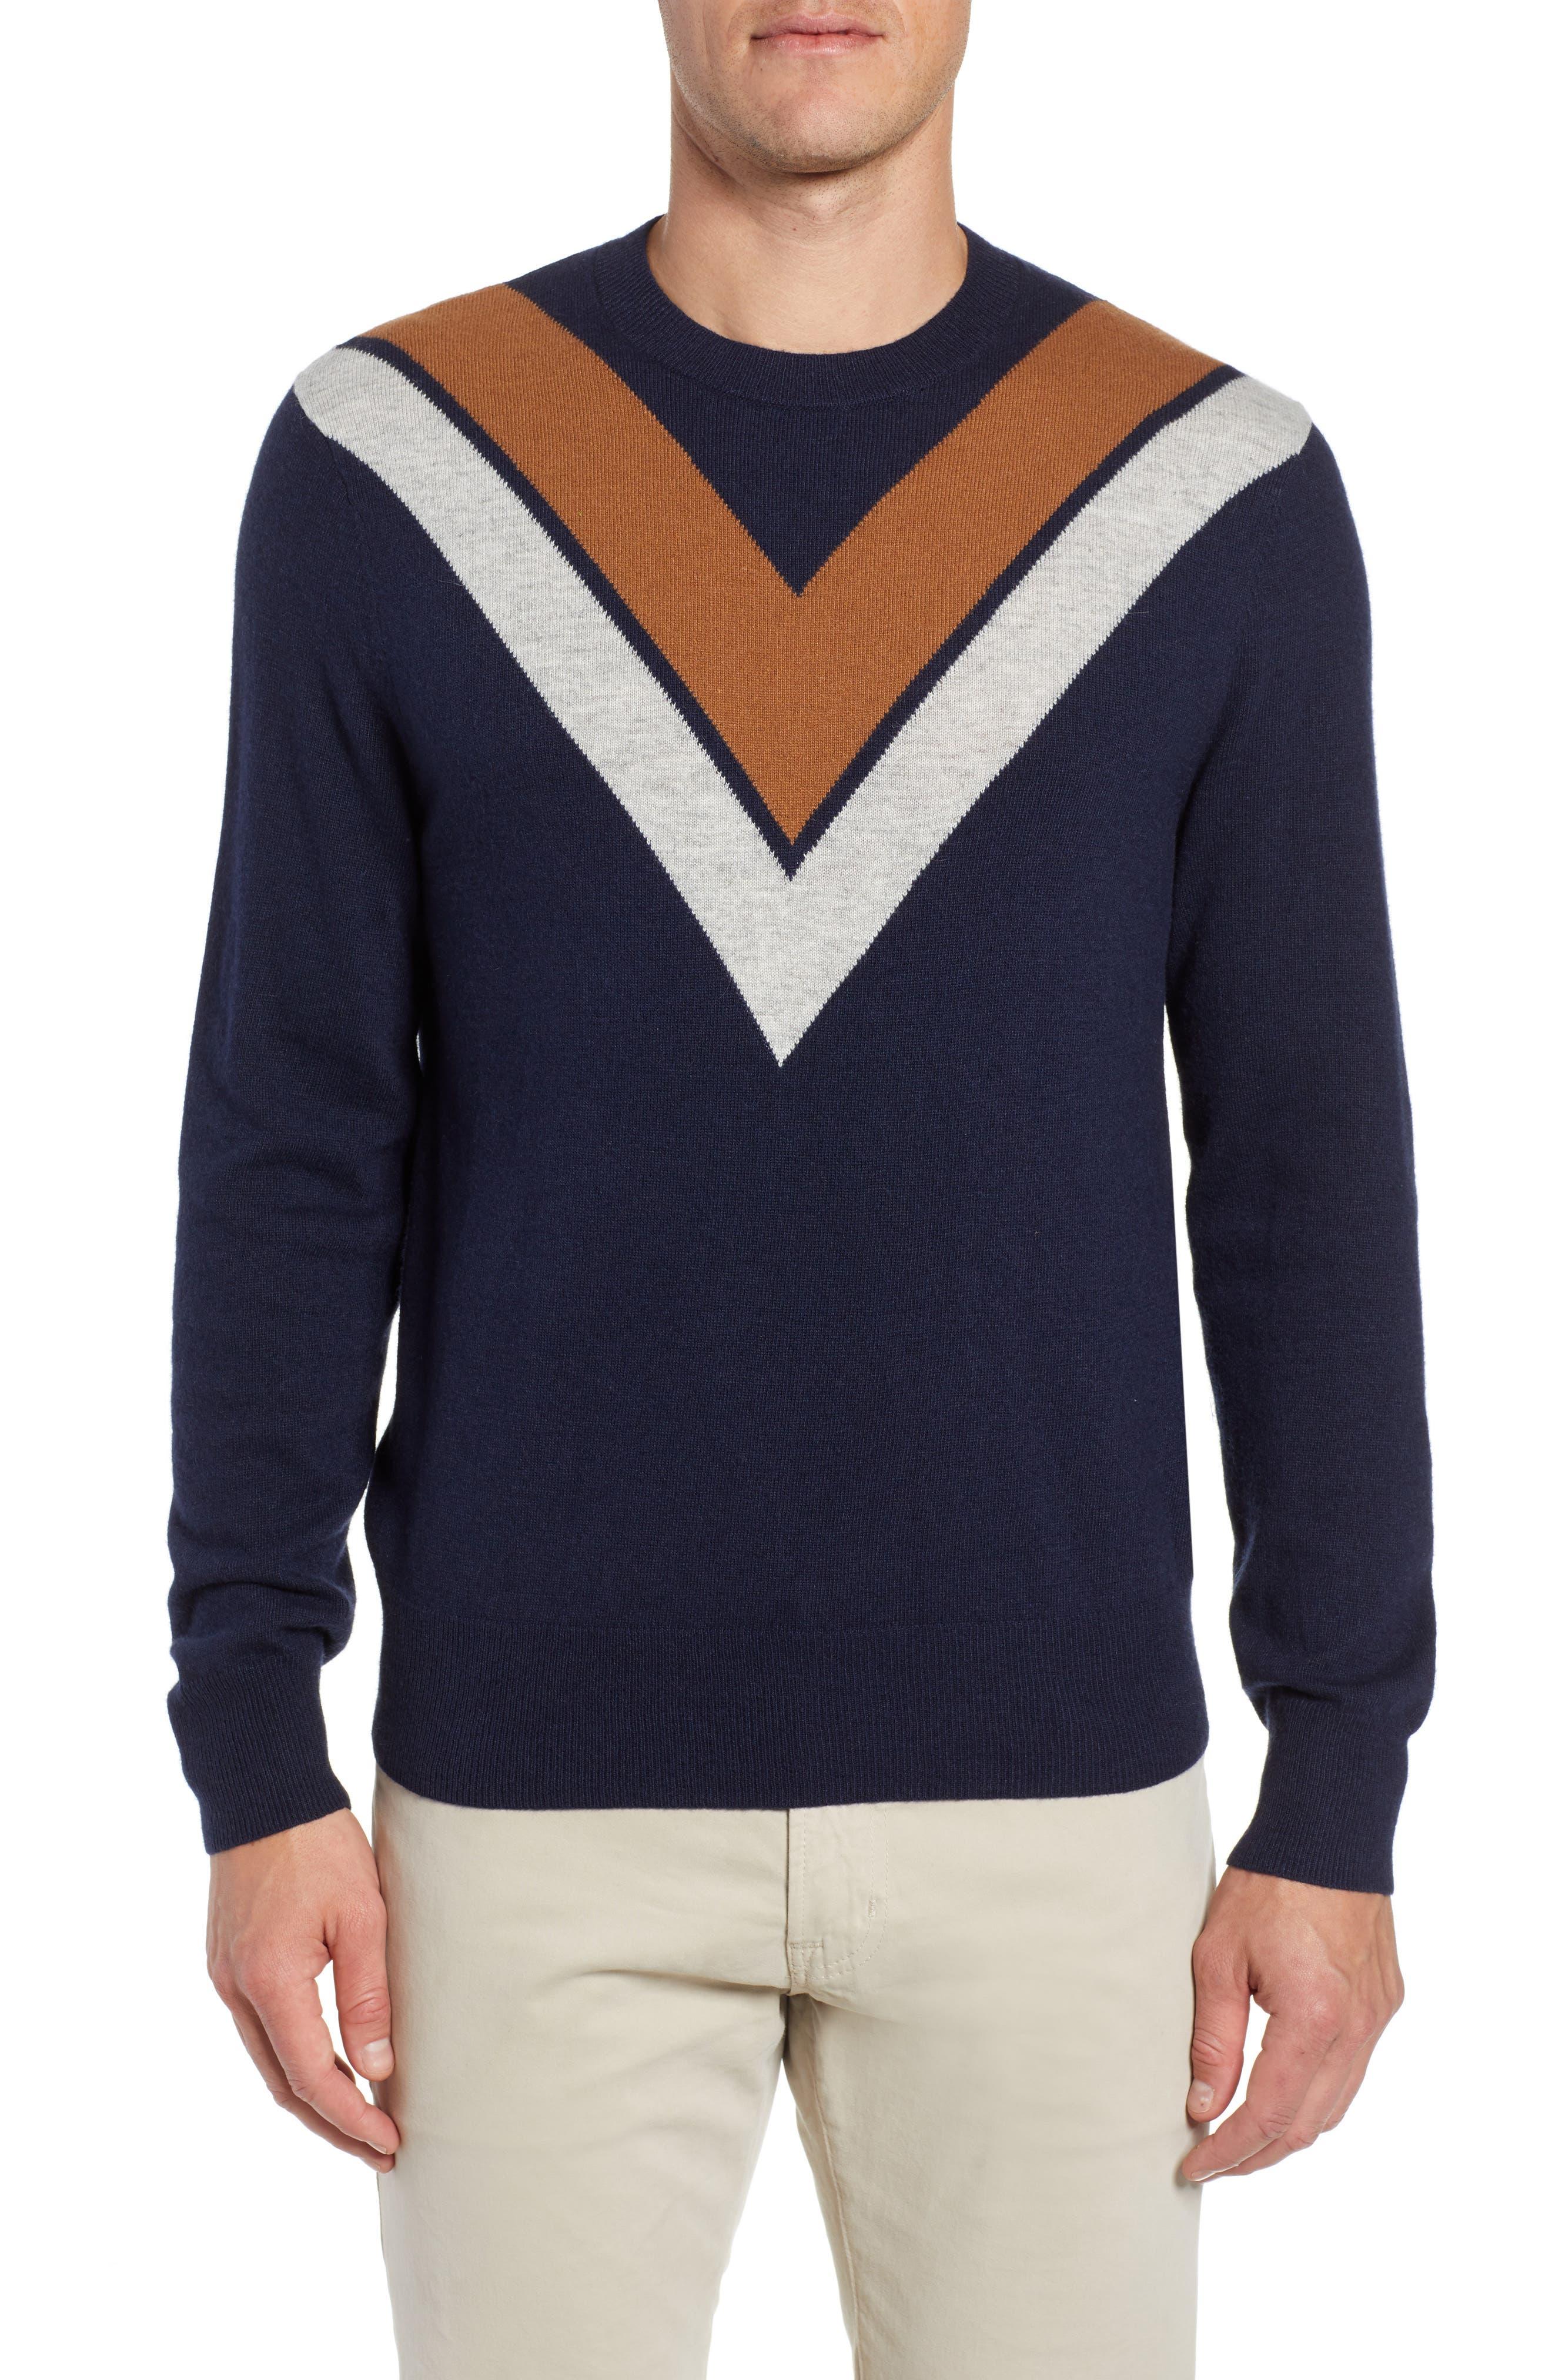 Minton V Crewneck Sweater,                         Main,                         color, DARK NAVY/ LHN/ BURNT SUGAR